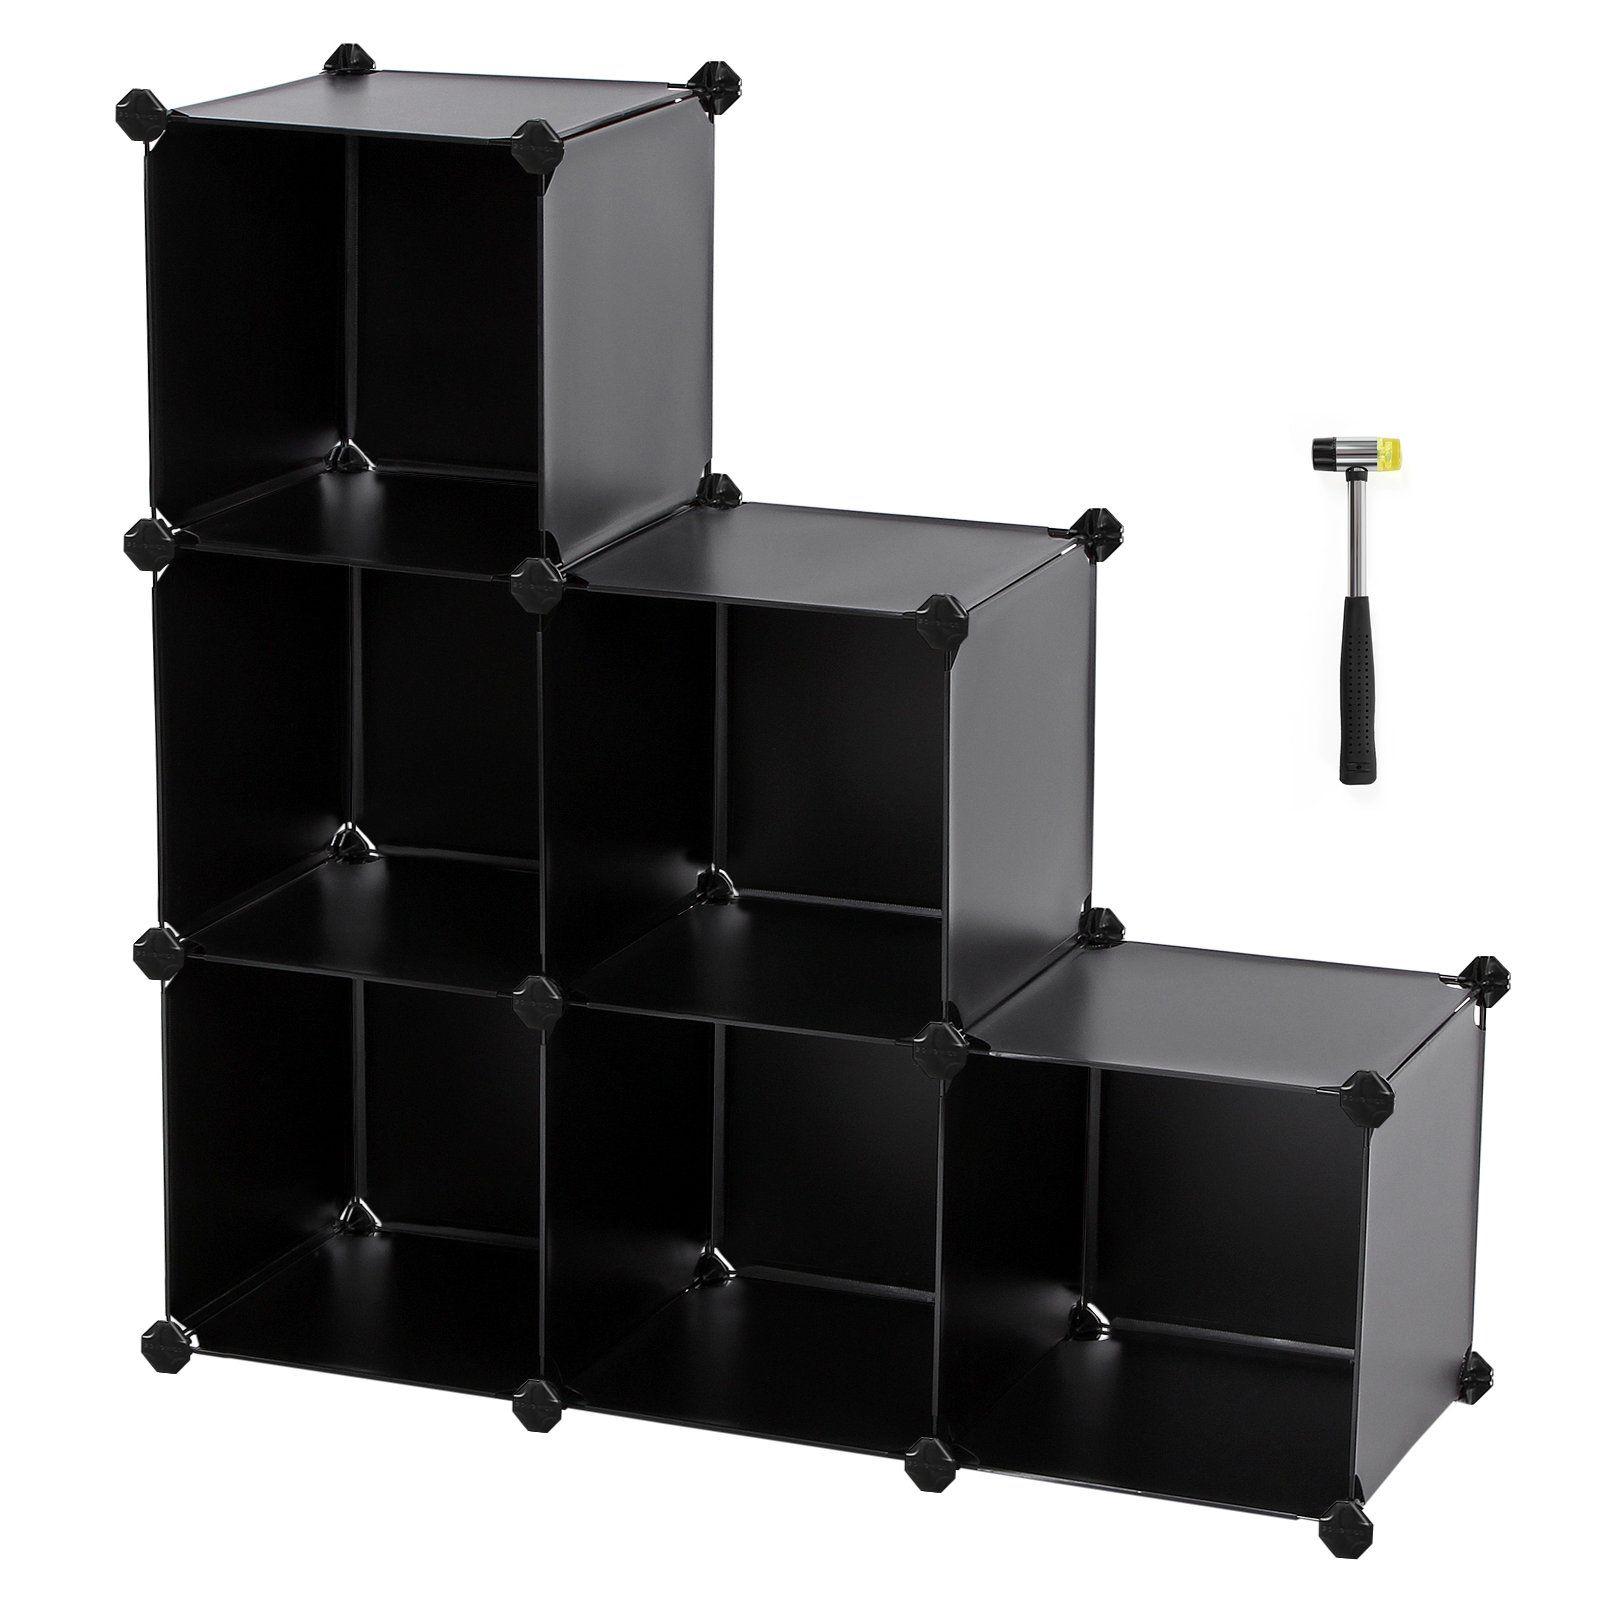 SONGMICS Storage Cube Organizer DIY Plastic Closet Shelf with Rubber